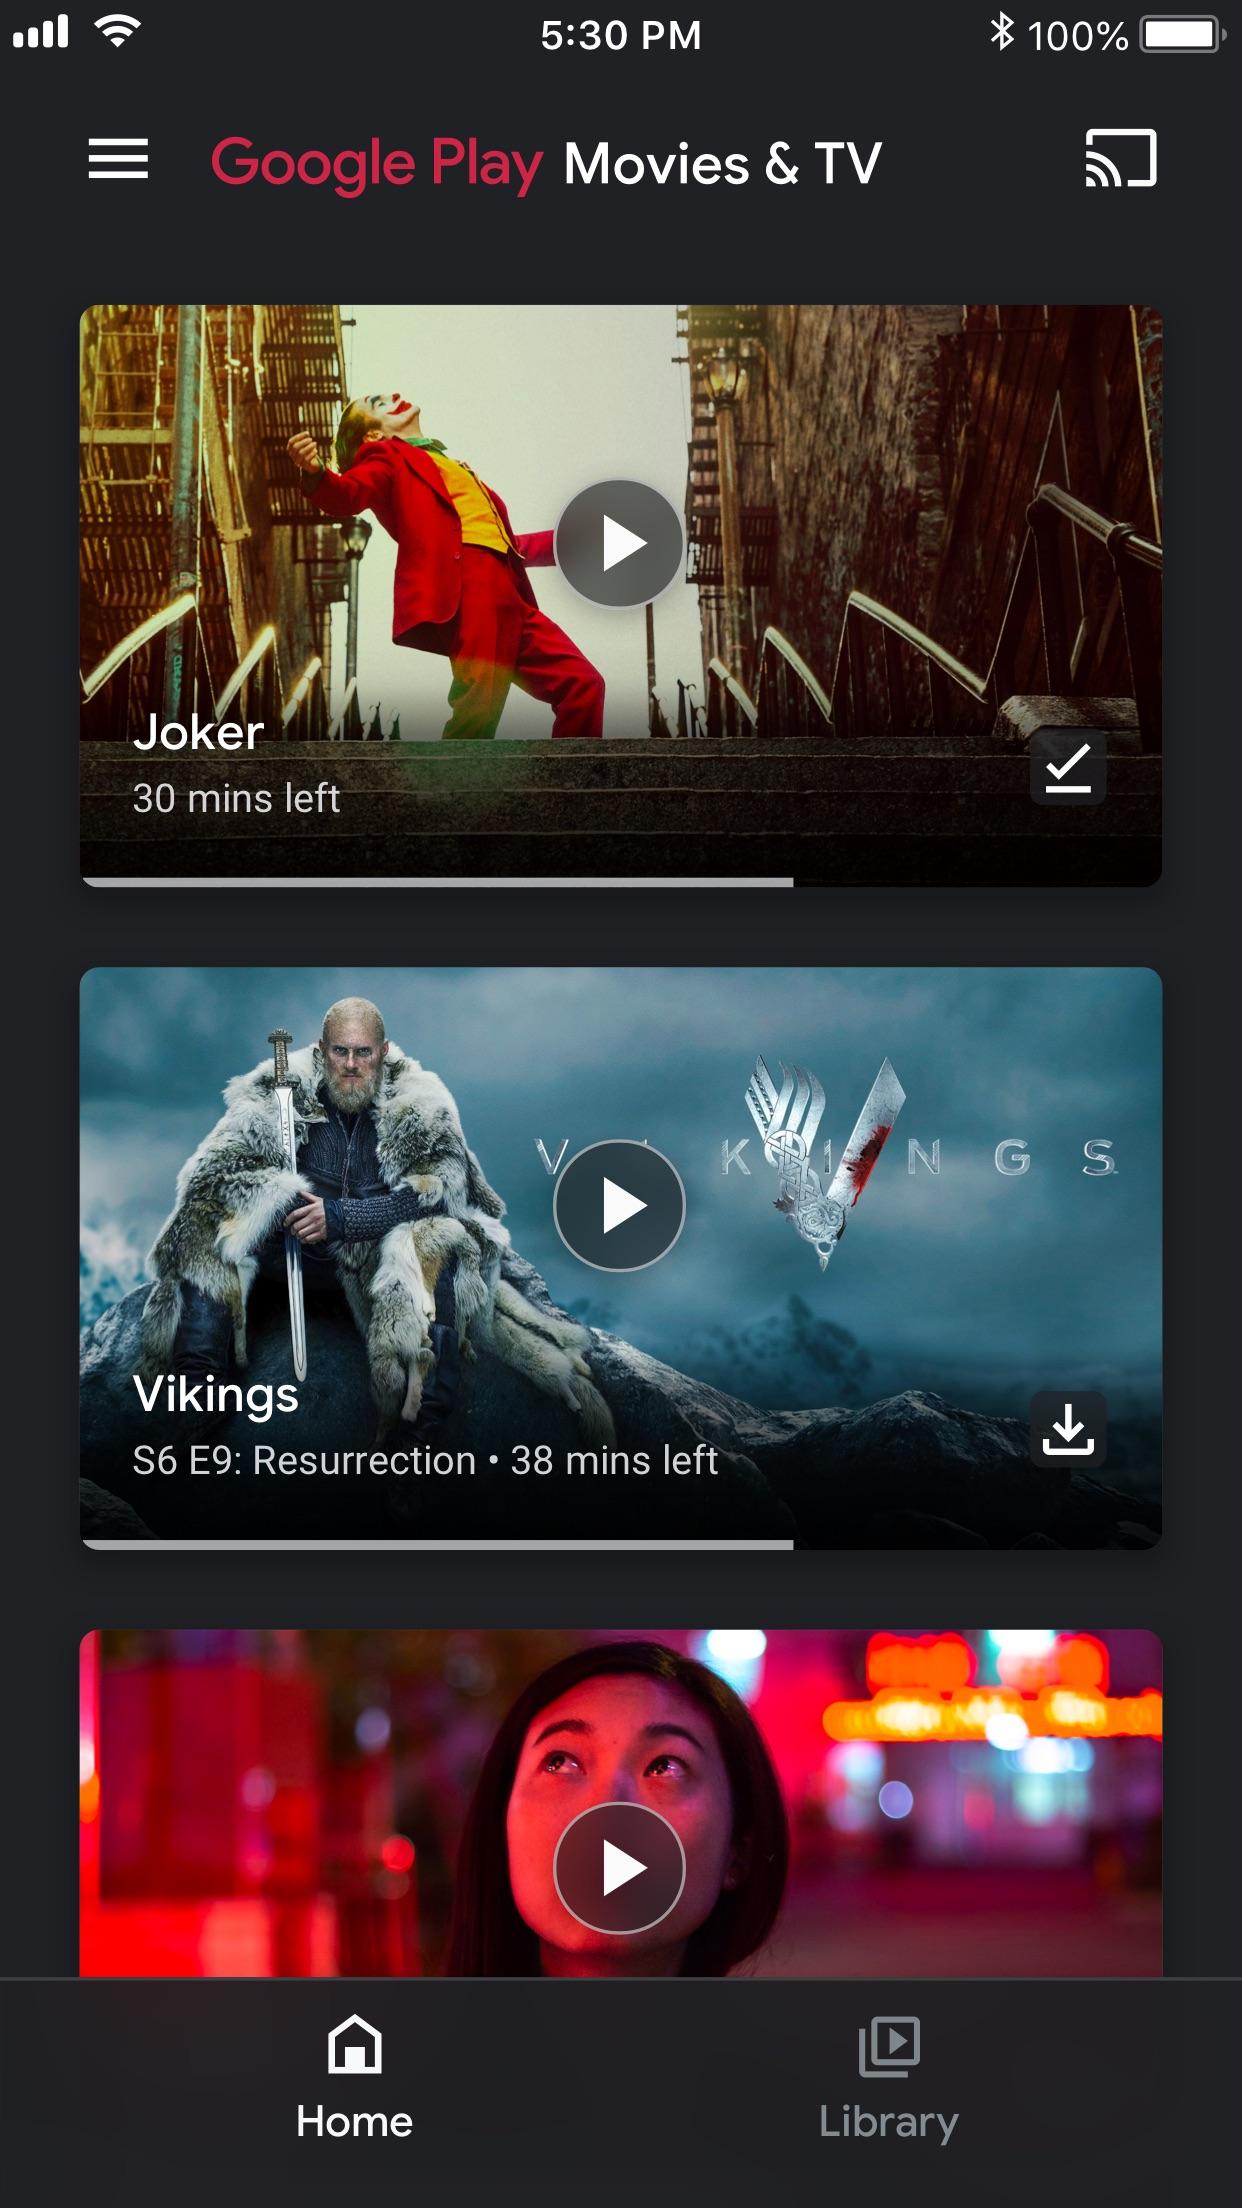 Google Play Movies & TV Screenshot